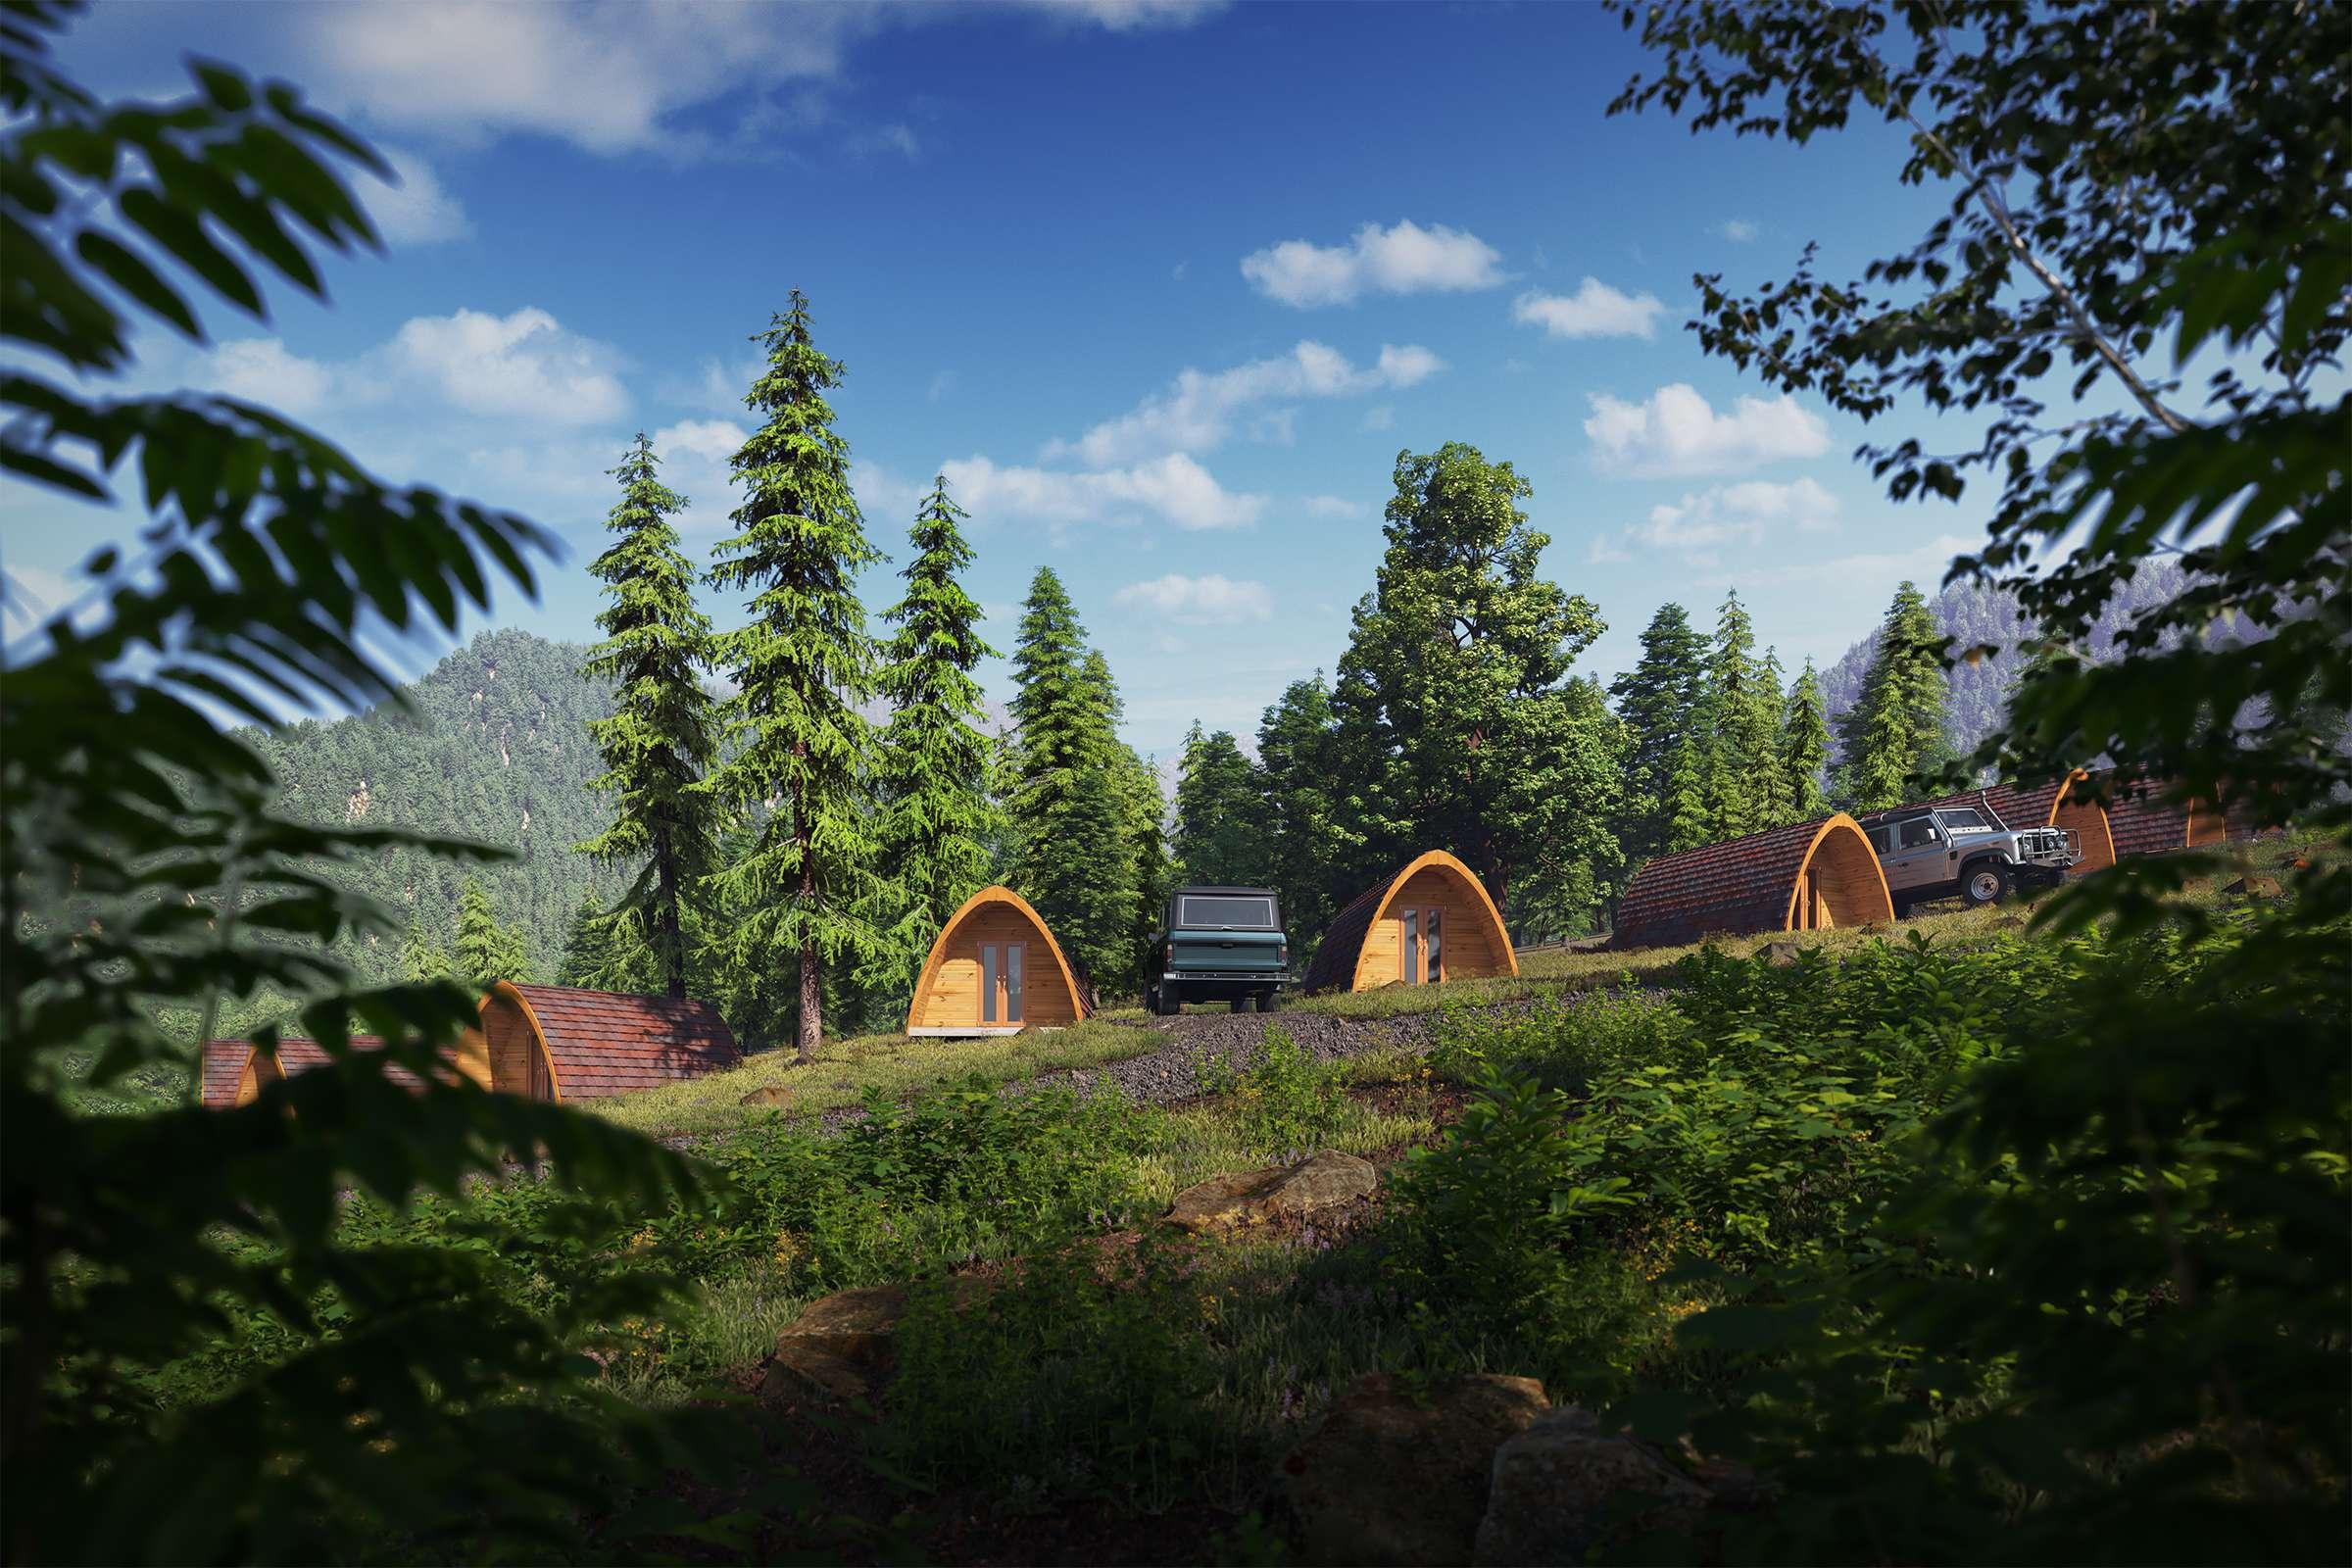 camping hut rendering